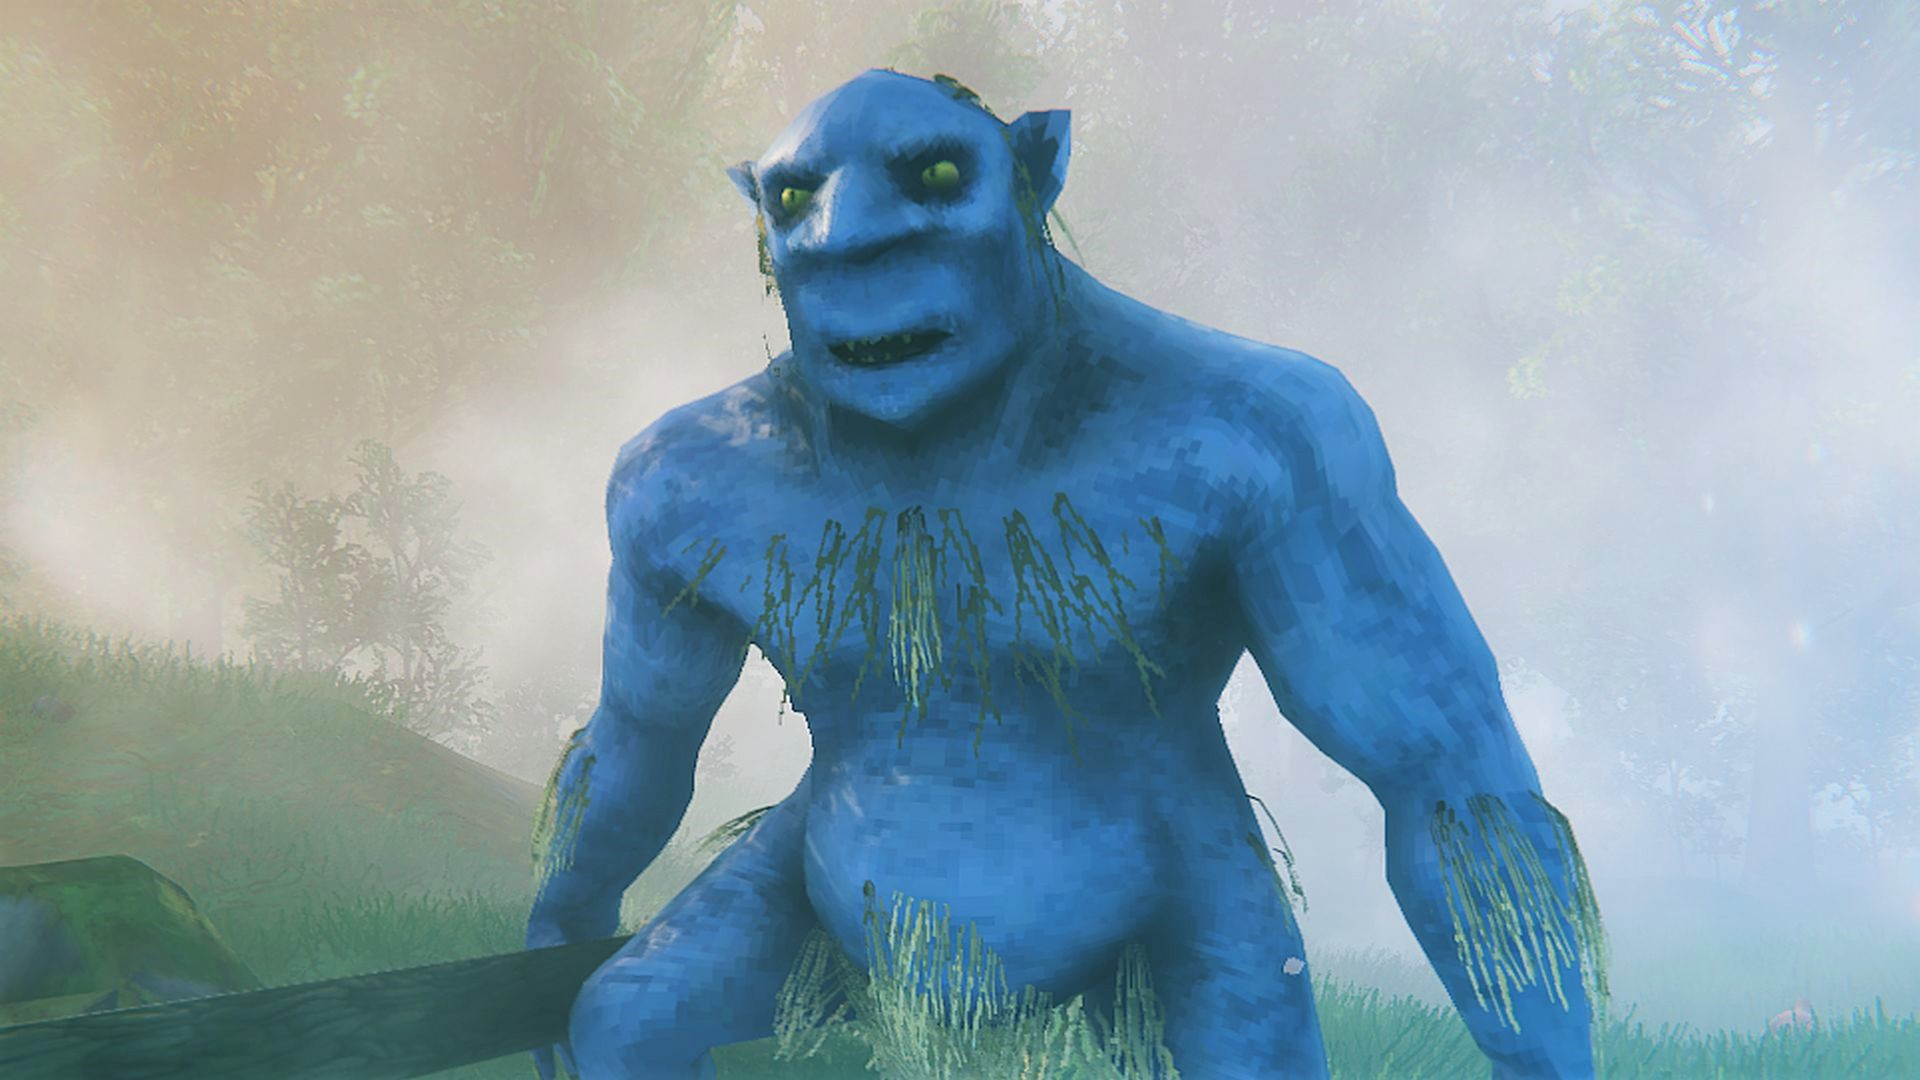 Valheim is getting more swol trolls next patch